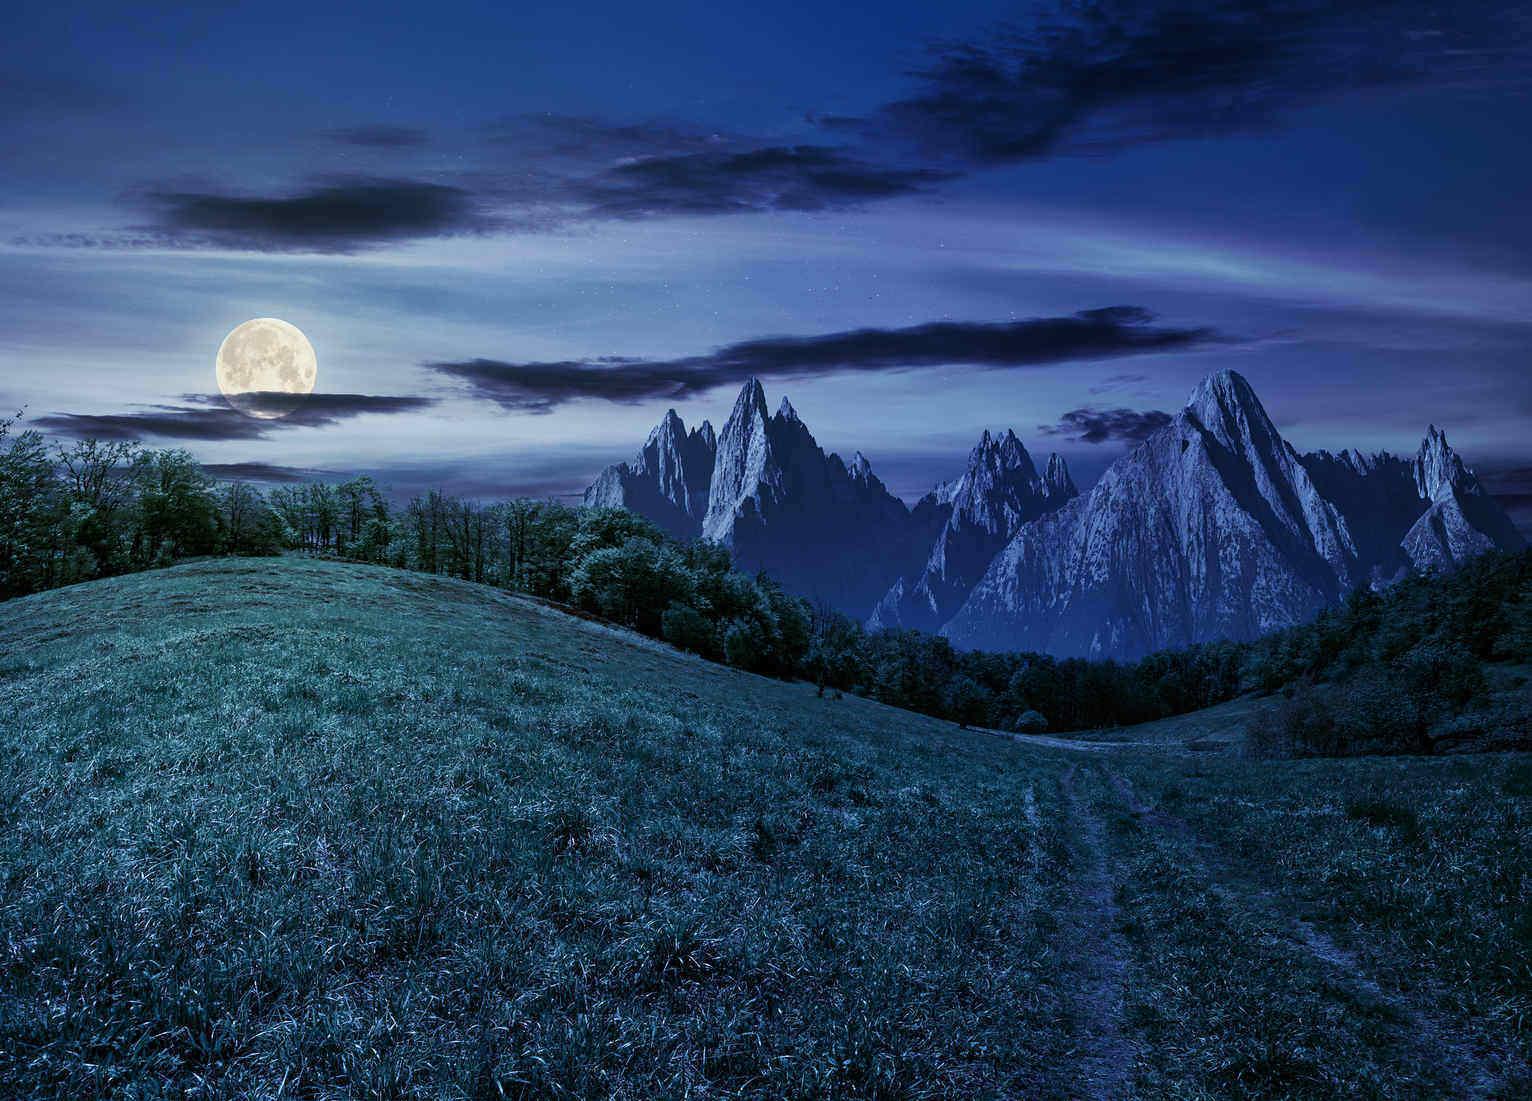 forest on grassy hillside in the Tatras